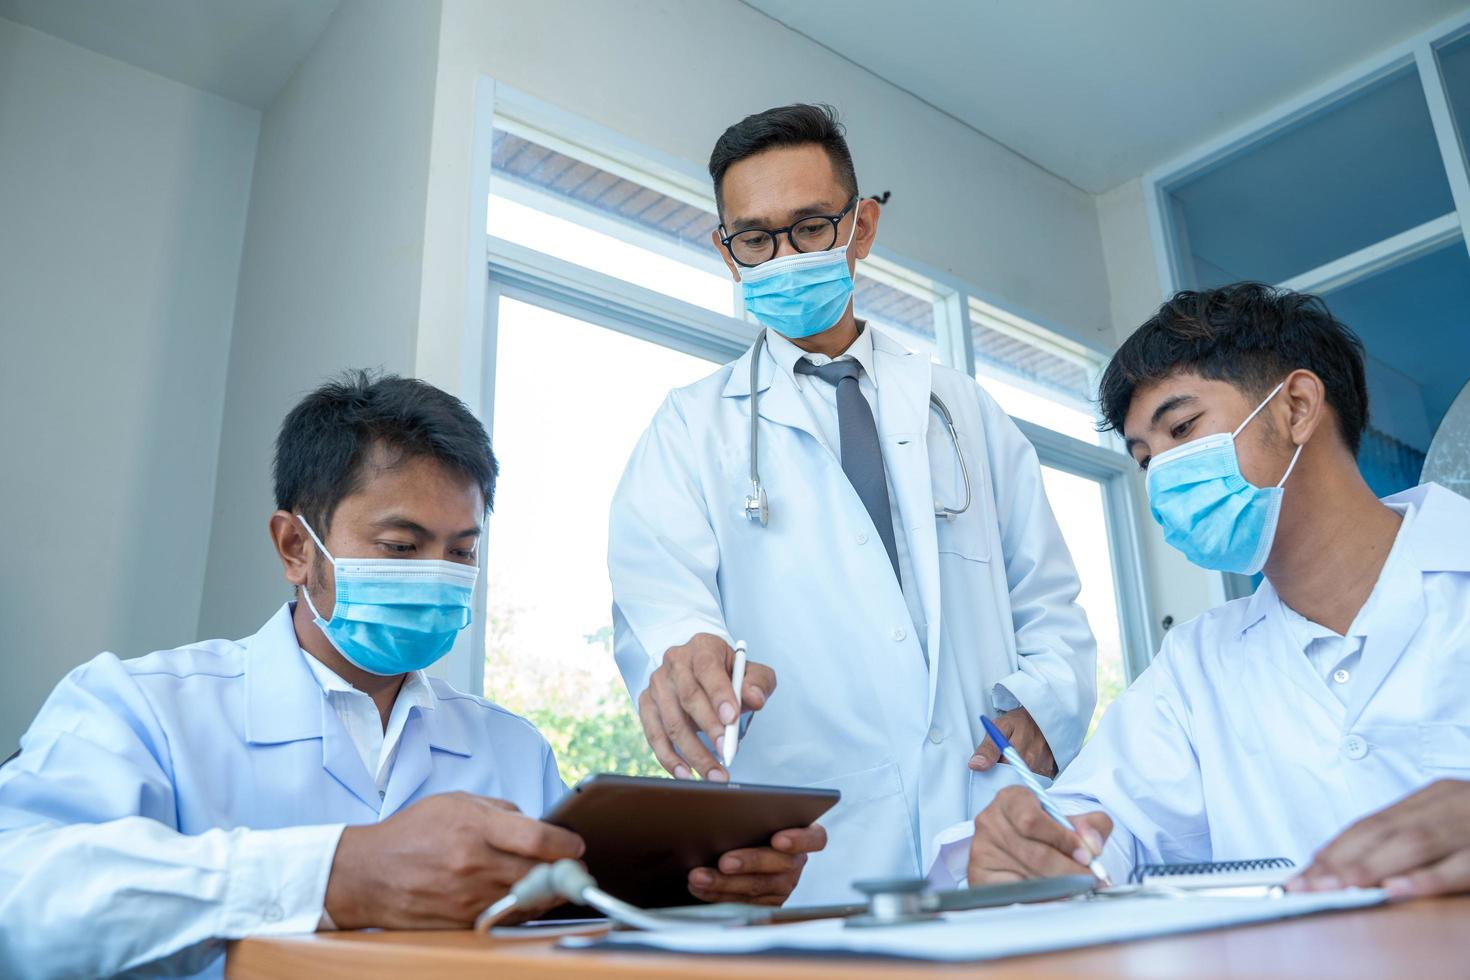 mannen met laboratoriumjassen en gezichtsmaskers foto